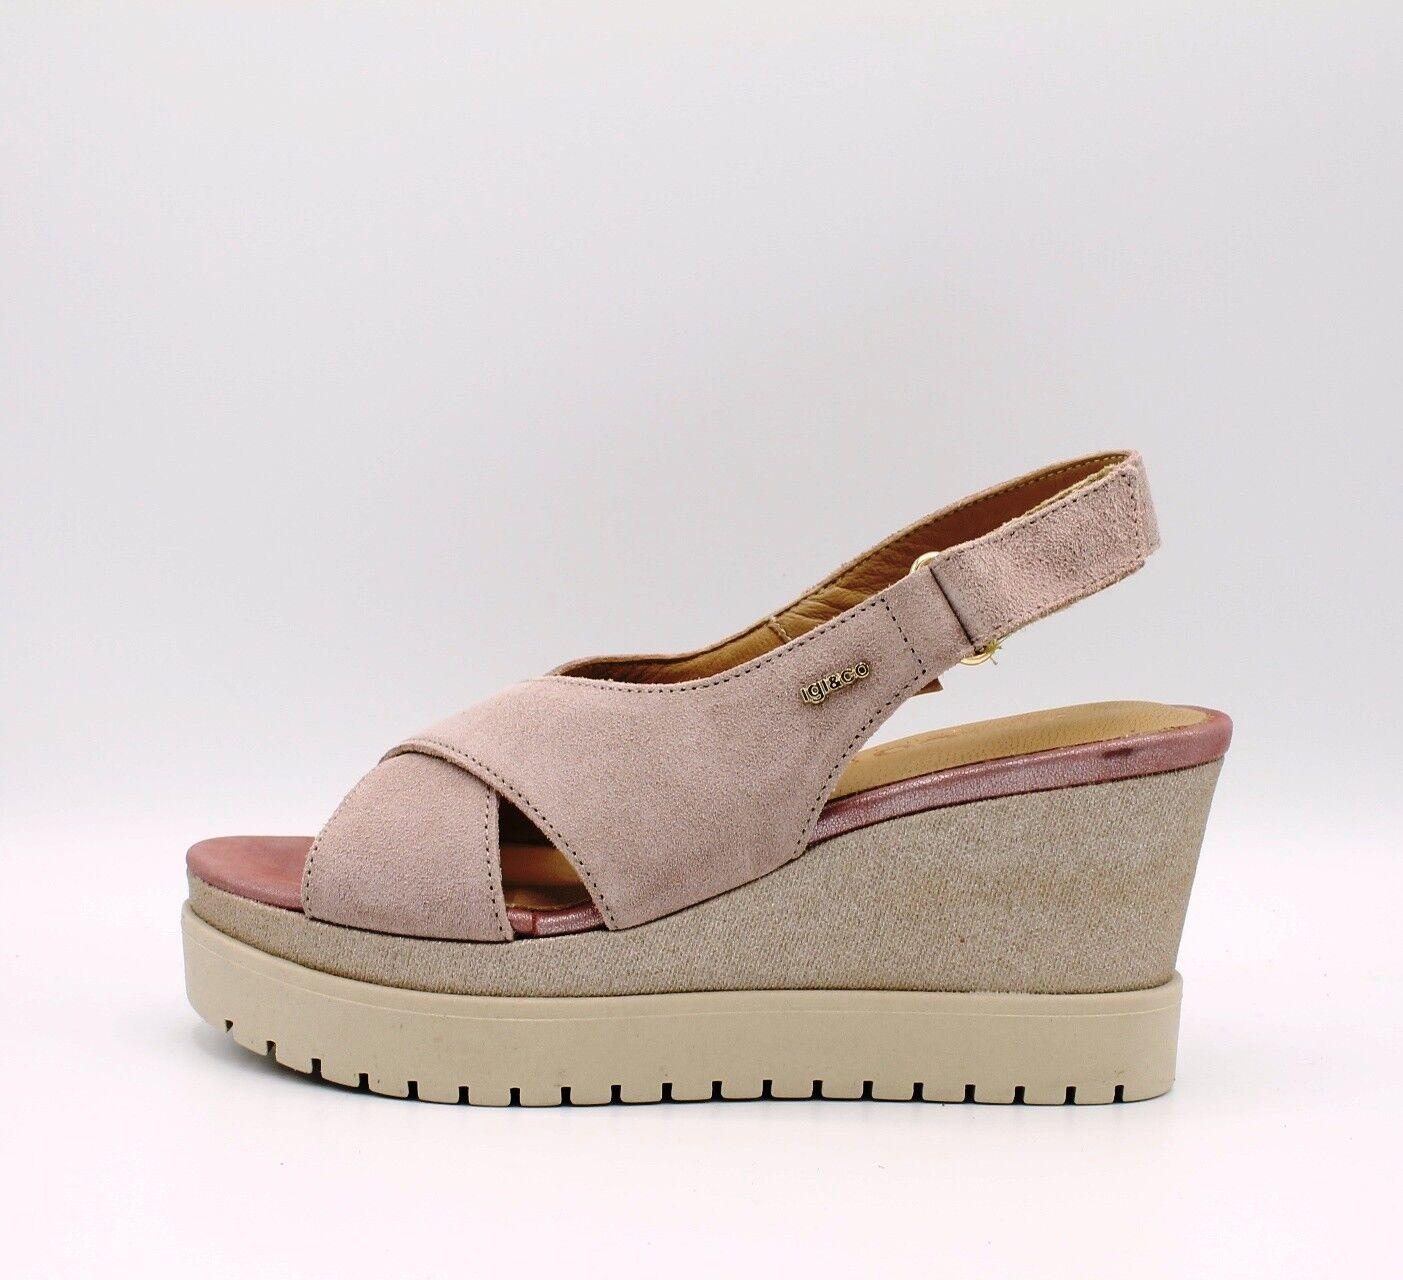 IGI & CO. DLT zeppa 1190555 sandali donna con zeppa DLT in morbido camoscio rosa antico 91c2b6